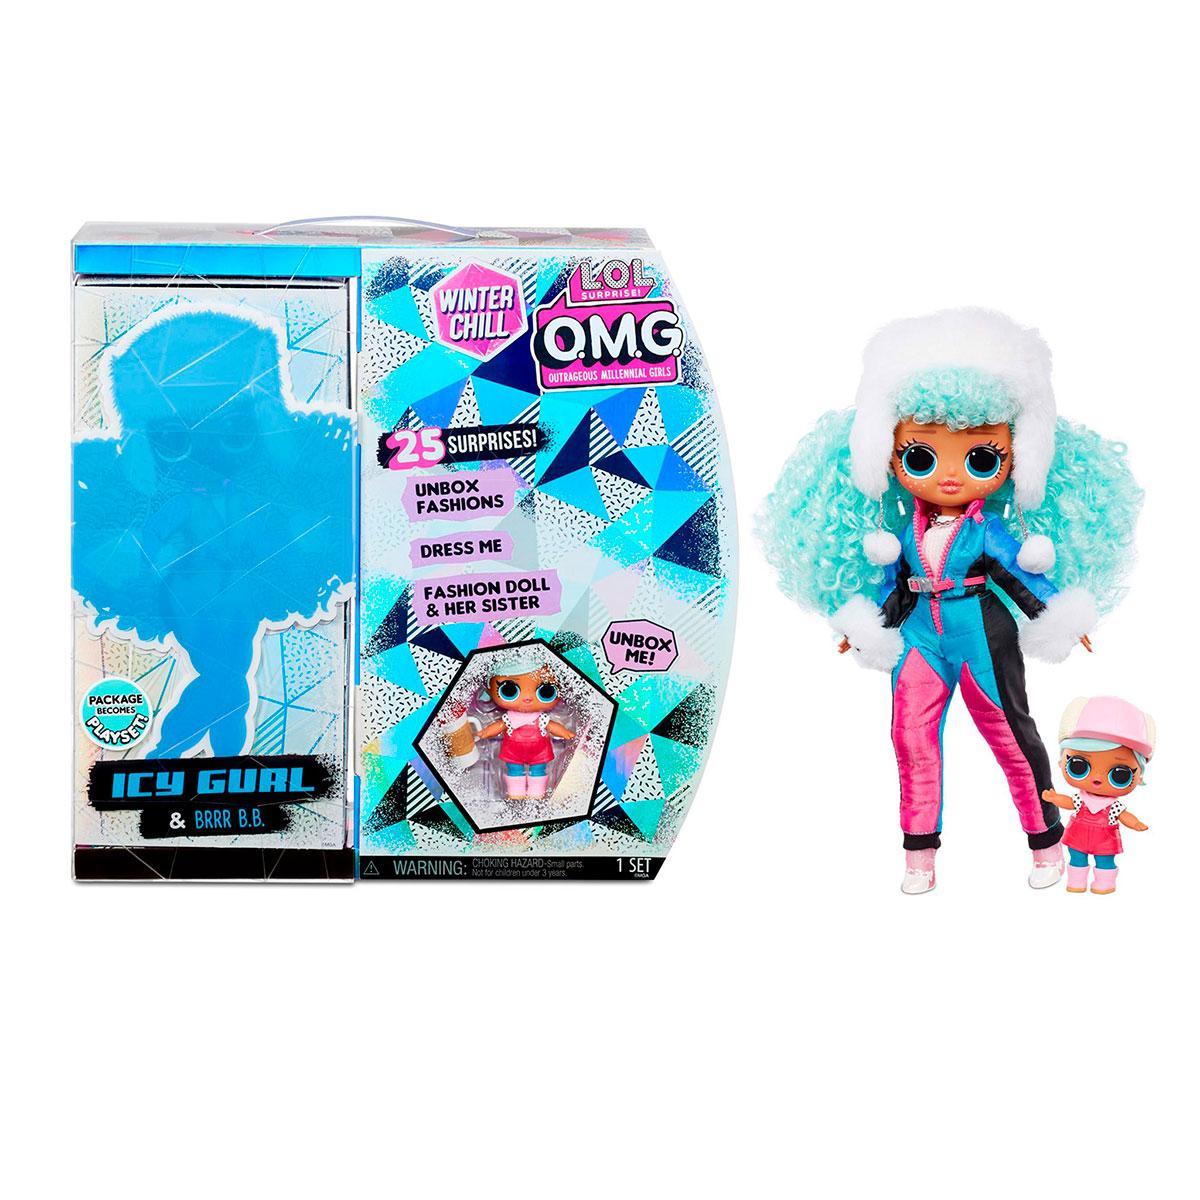 Кукла ЛОЛ Сюрприз ОМГ Ледяная Леди L.O.L. Surprise! O.M.G. Winter Chill ICY Gurl Fashion Doll OMG LOL  570240